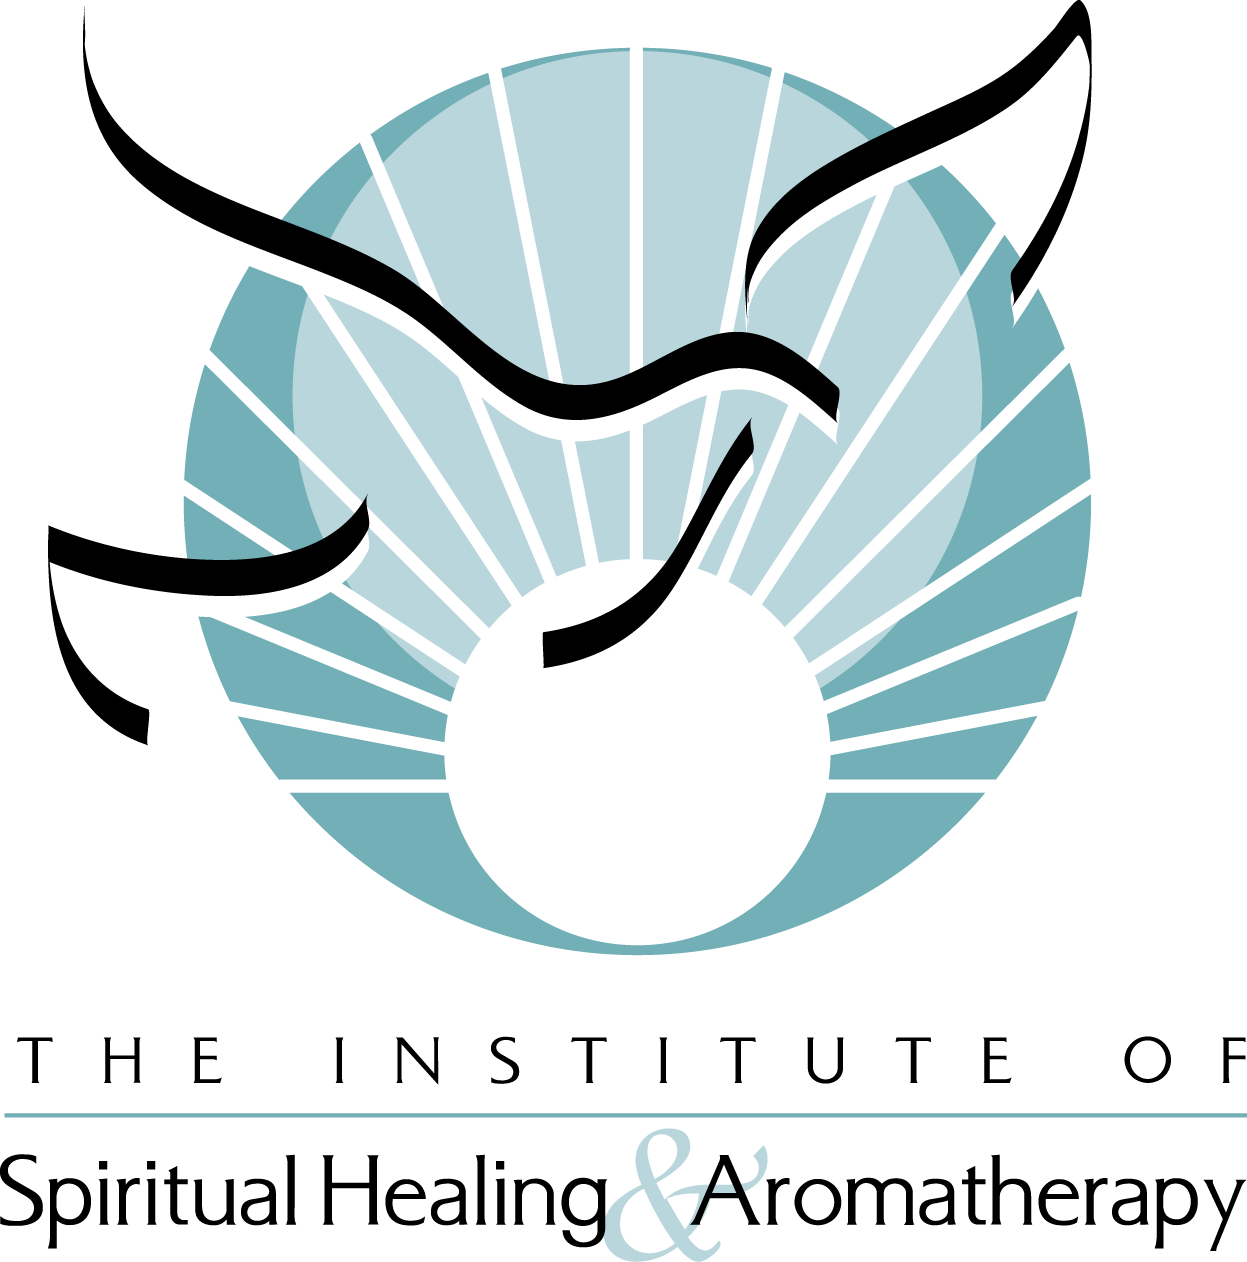 Institute of Spiritual Healing & Aromatherapy, Inc.